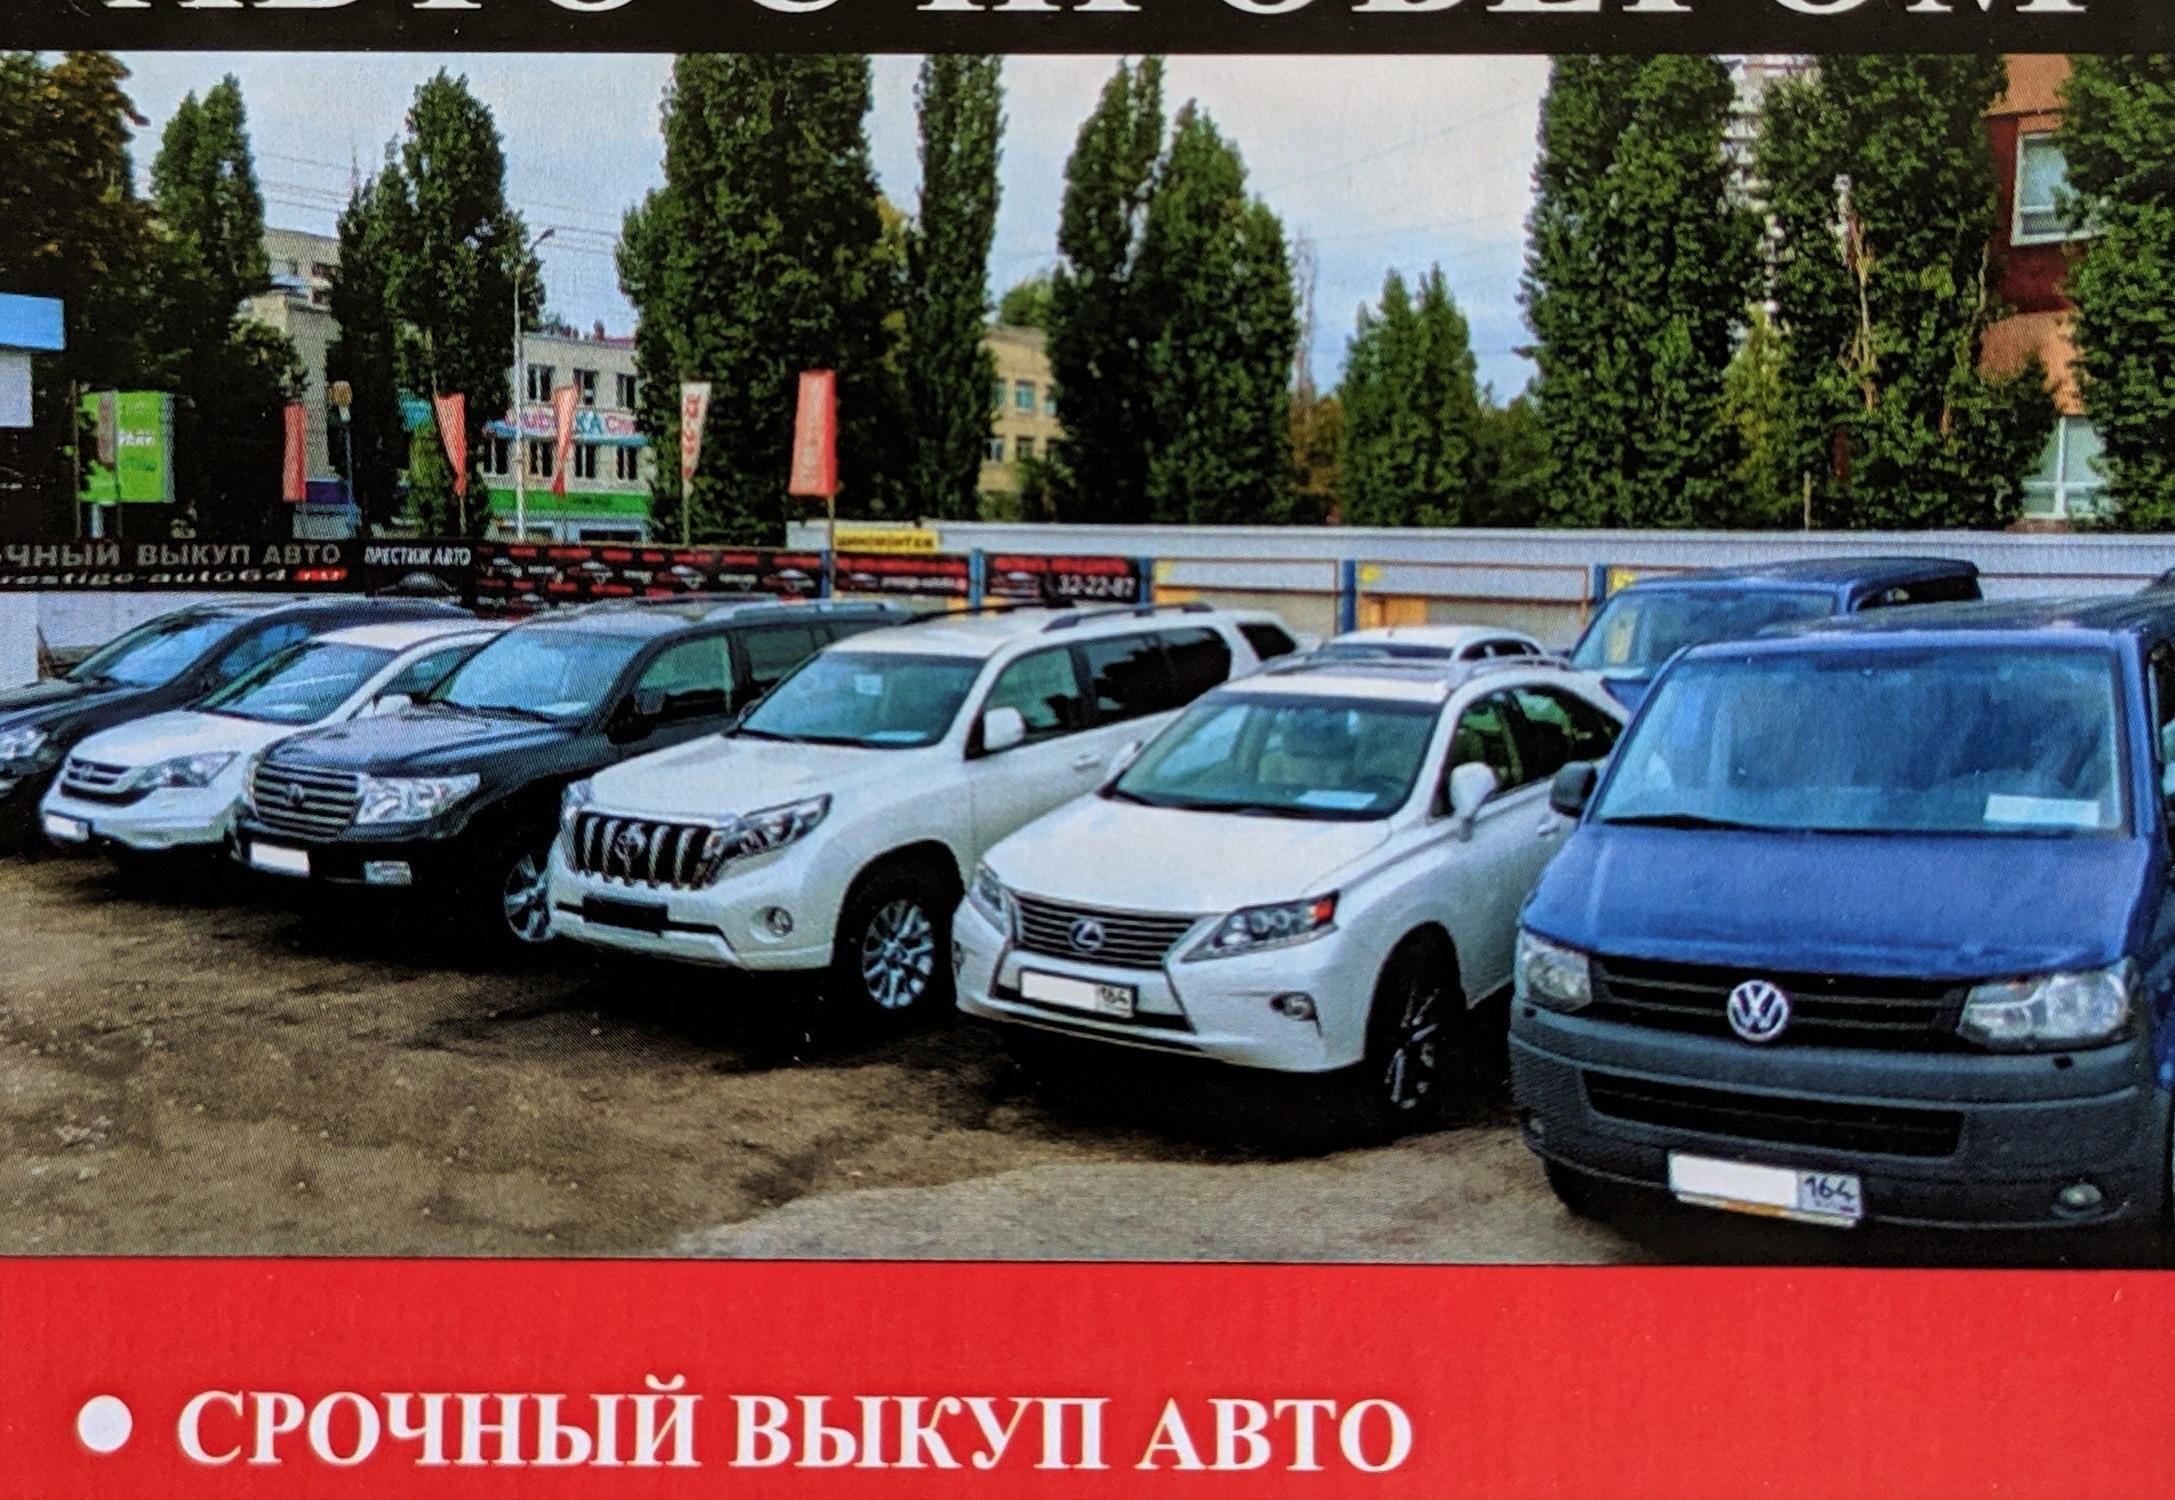 Авто саратов в залоге у банка автосалоны москва без пробега